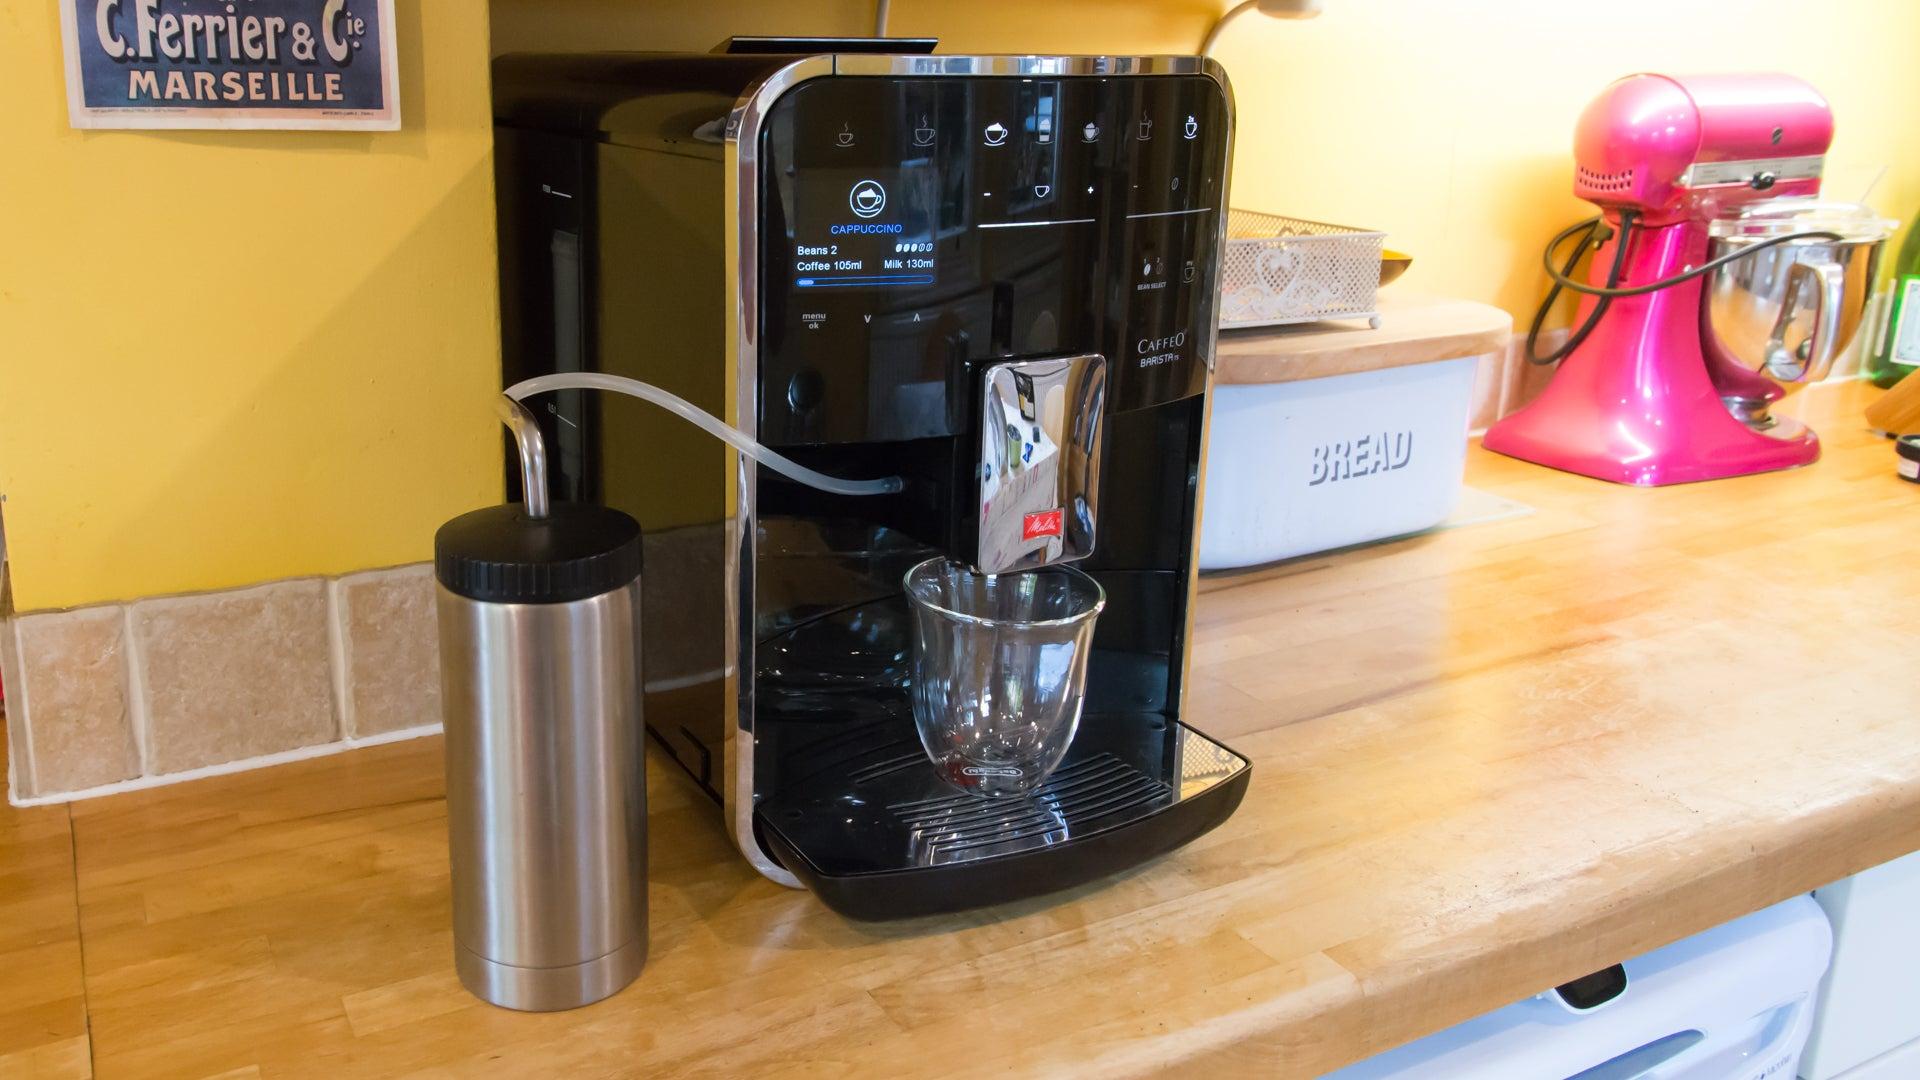 850ffe81f4b ☕️Best coffee machine 2019: Find your top coffee maker here ...